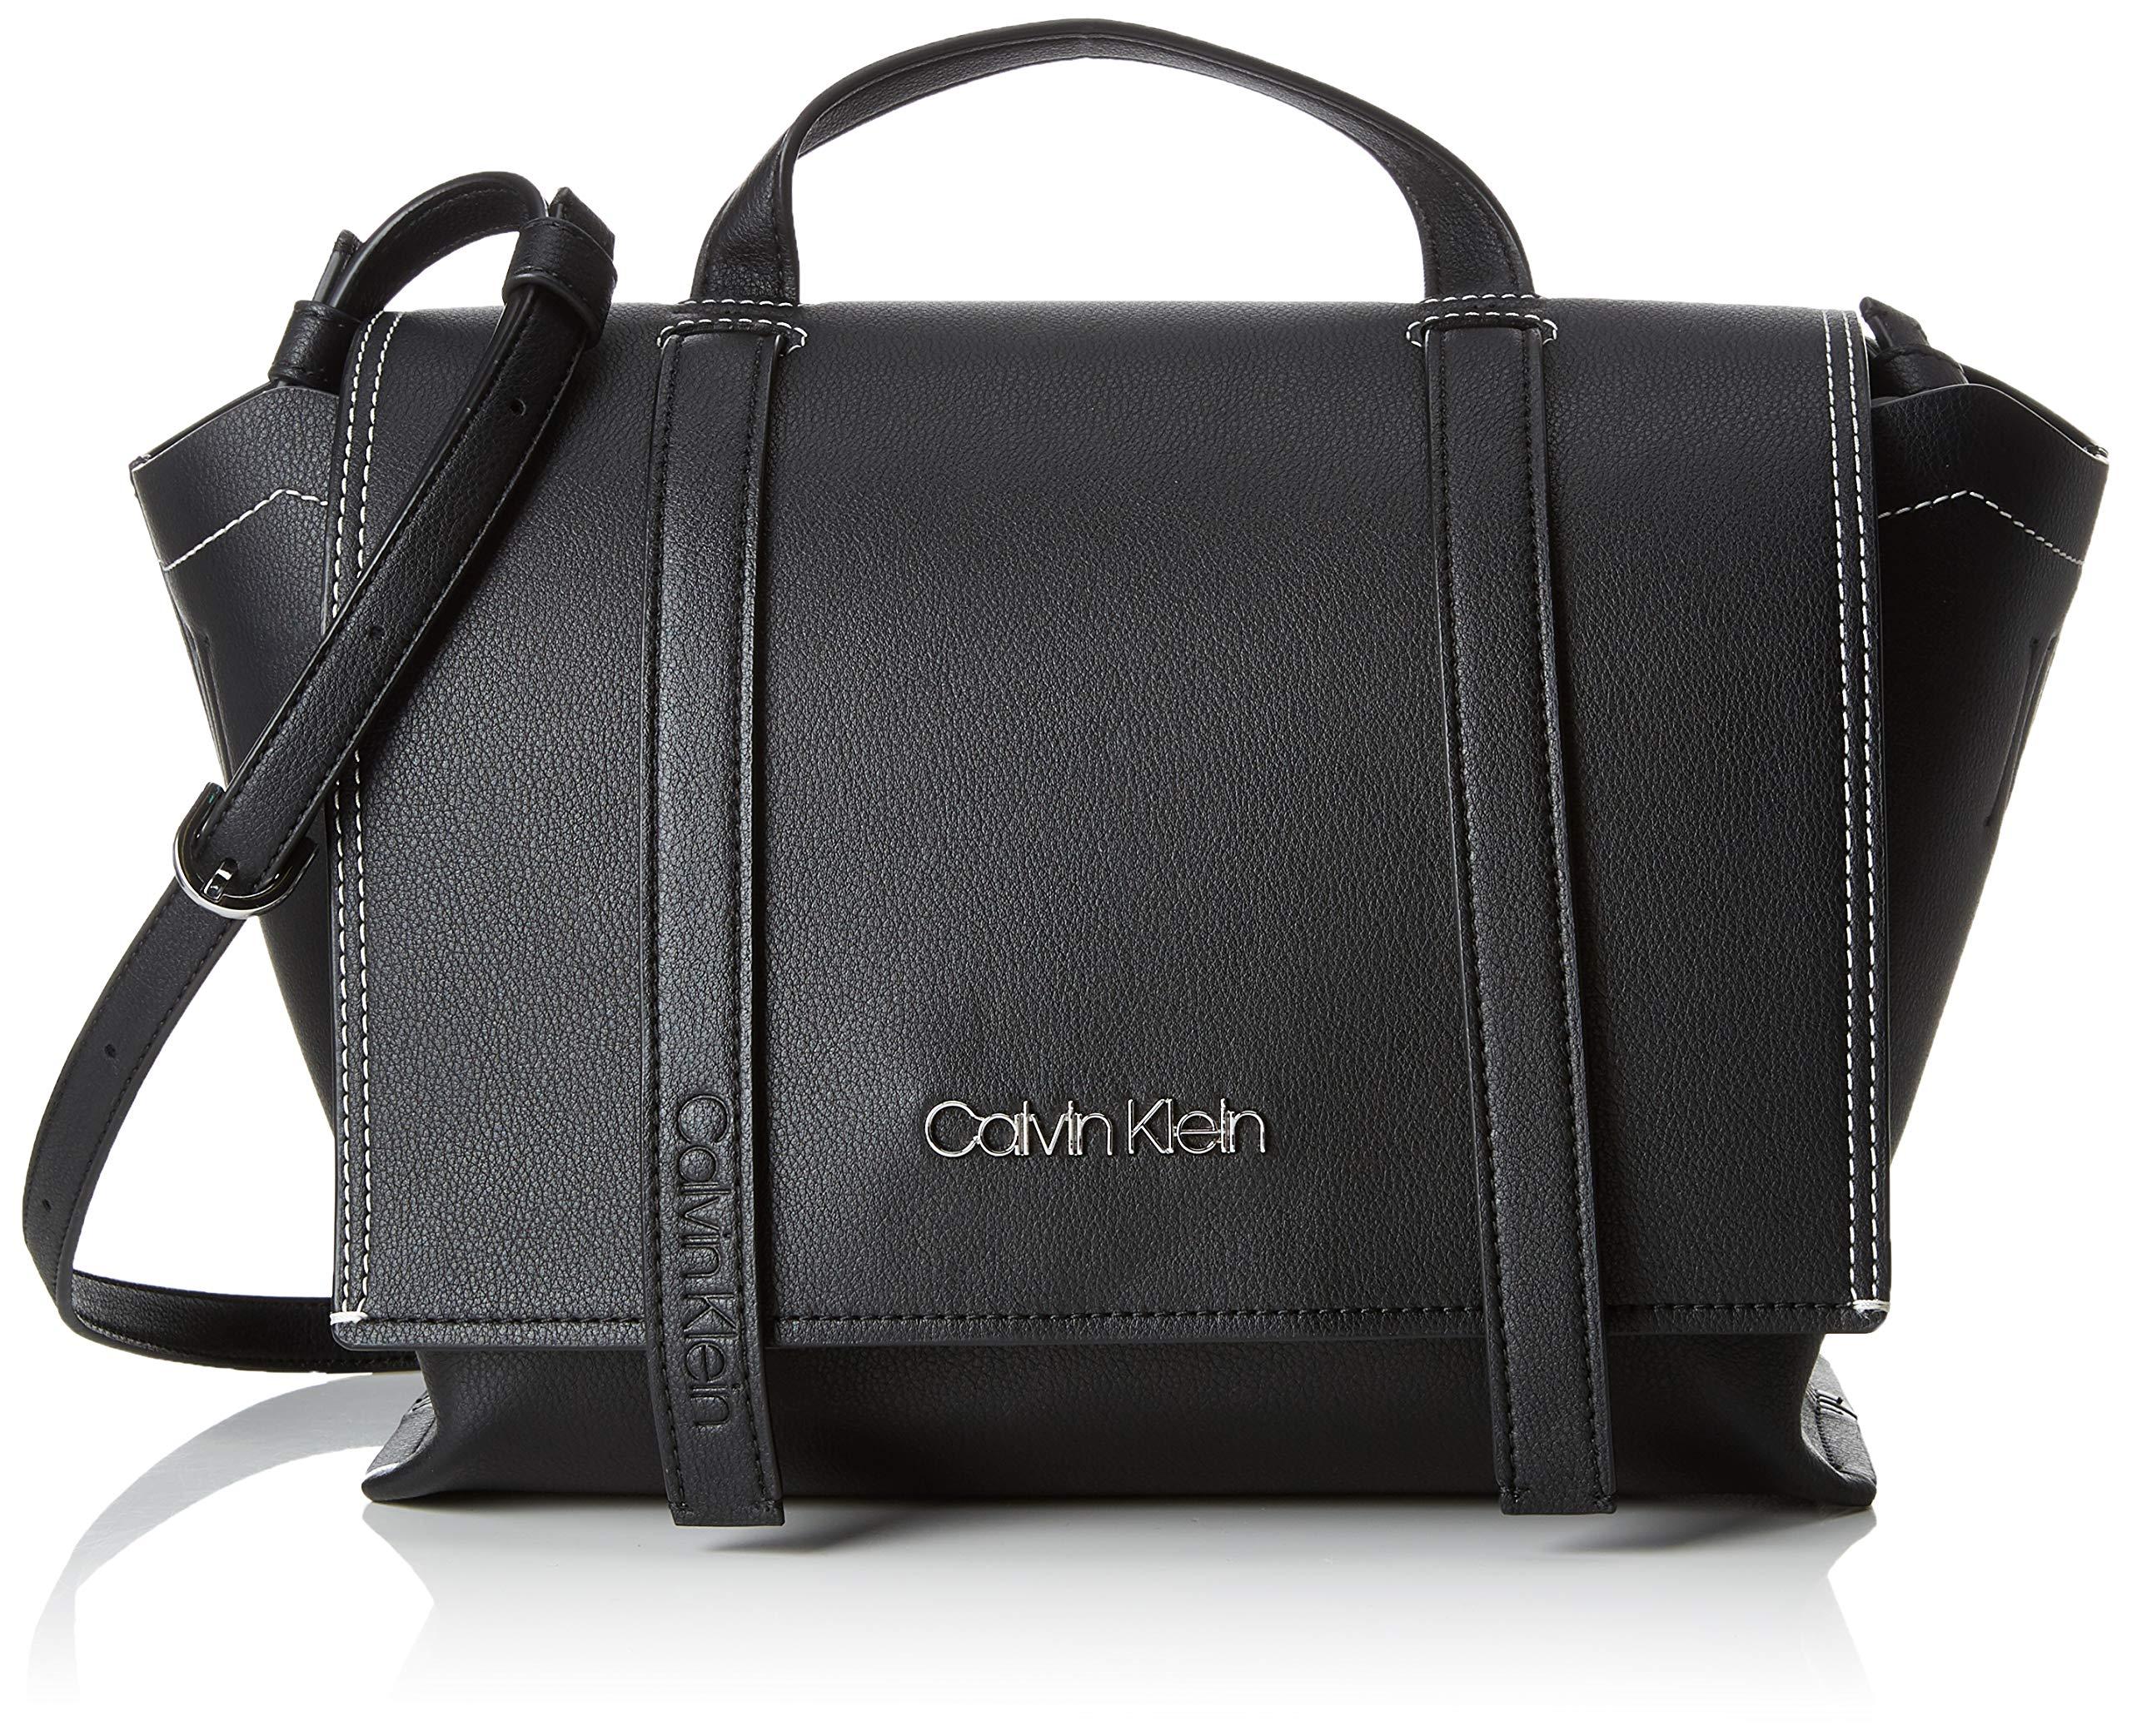 H Calvin T X 5x30x41 Klein FemmeNoirblack12 Top Cmb Porté Slide HandleSac Main nXwN8ZP0Ok